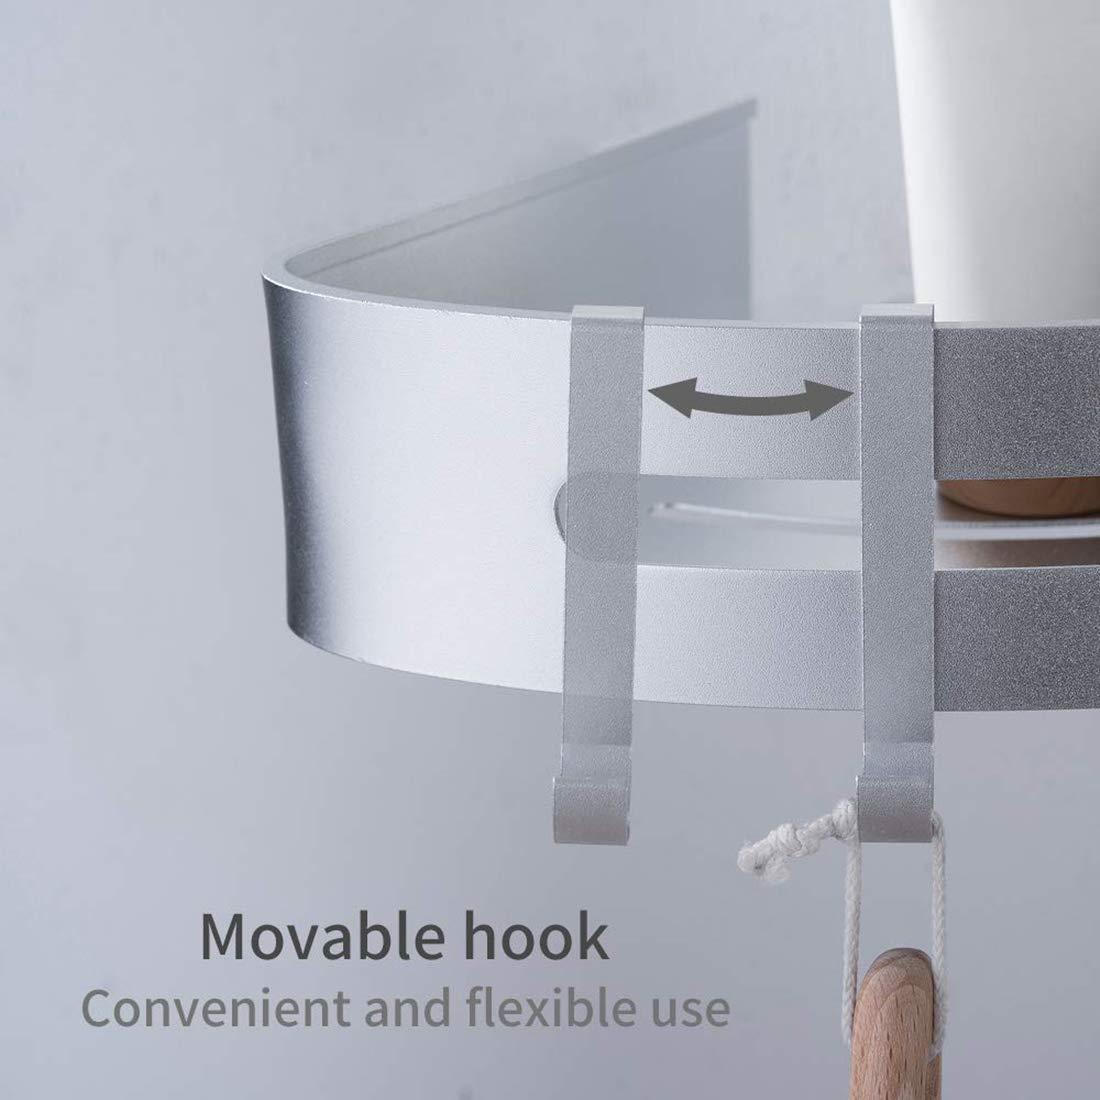 FLM Estantes para Ducha Pegamento Patentado Autoadhesivo 3M Estanter/ía de Esquina para Ba/ño Ducha,Triangle